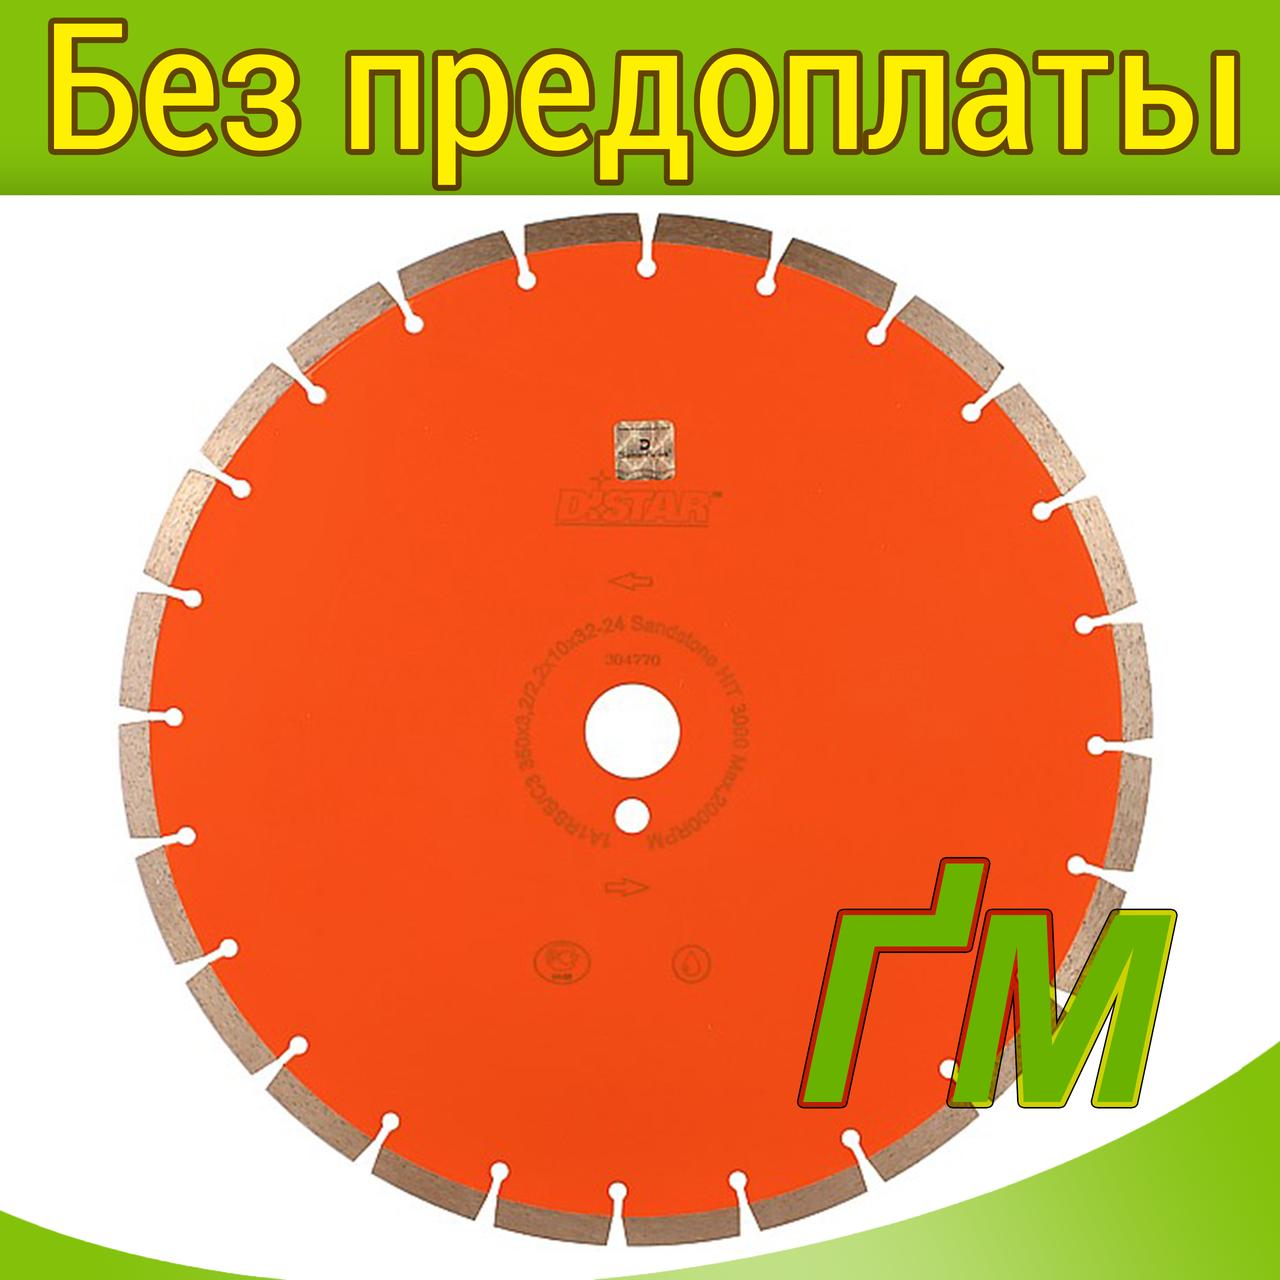 Алмазные диски для станков Sandstone 3000 1A1RSS/C3 300x3,0/2,0x10x32-22